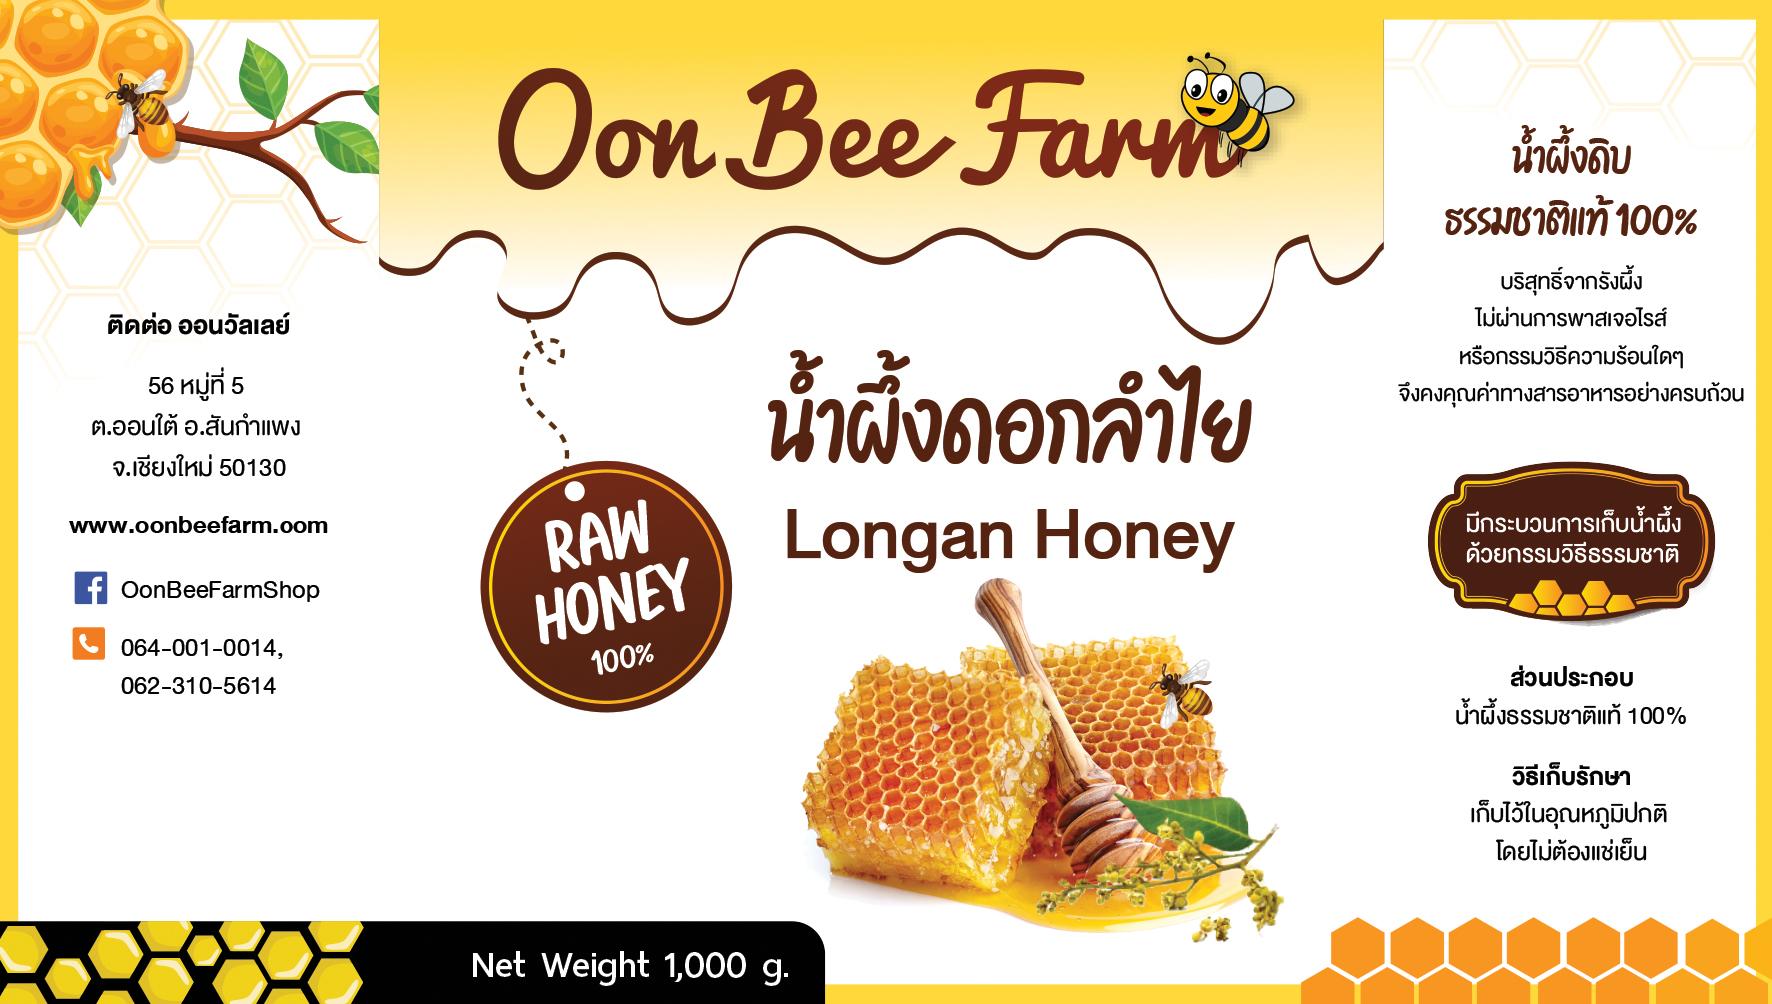 Oon Bee Farm น้ำผึ้งดอกลำไย น้ำผึ้งดิบธรรมชาติแท้ 100% มีกระบวนการเก็บน้ำผึ้งด้วยกรรมวิธีธรรมชาติ